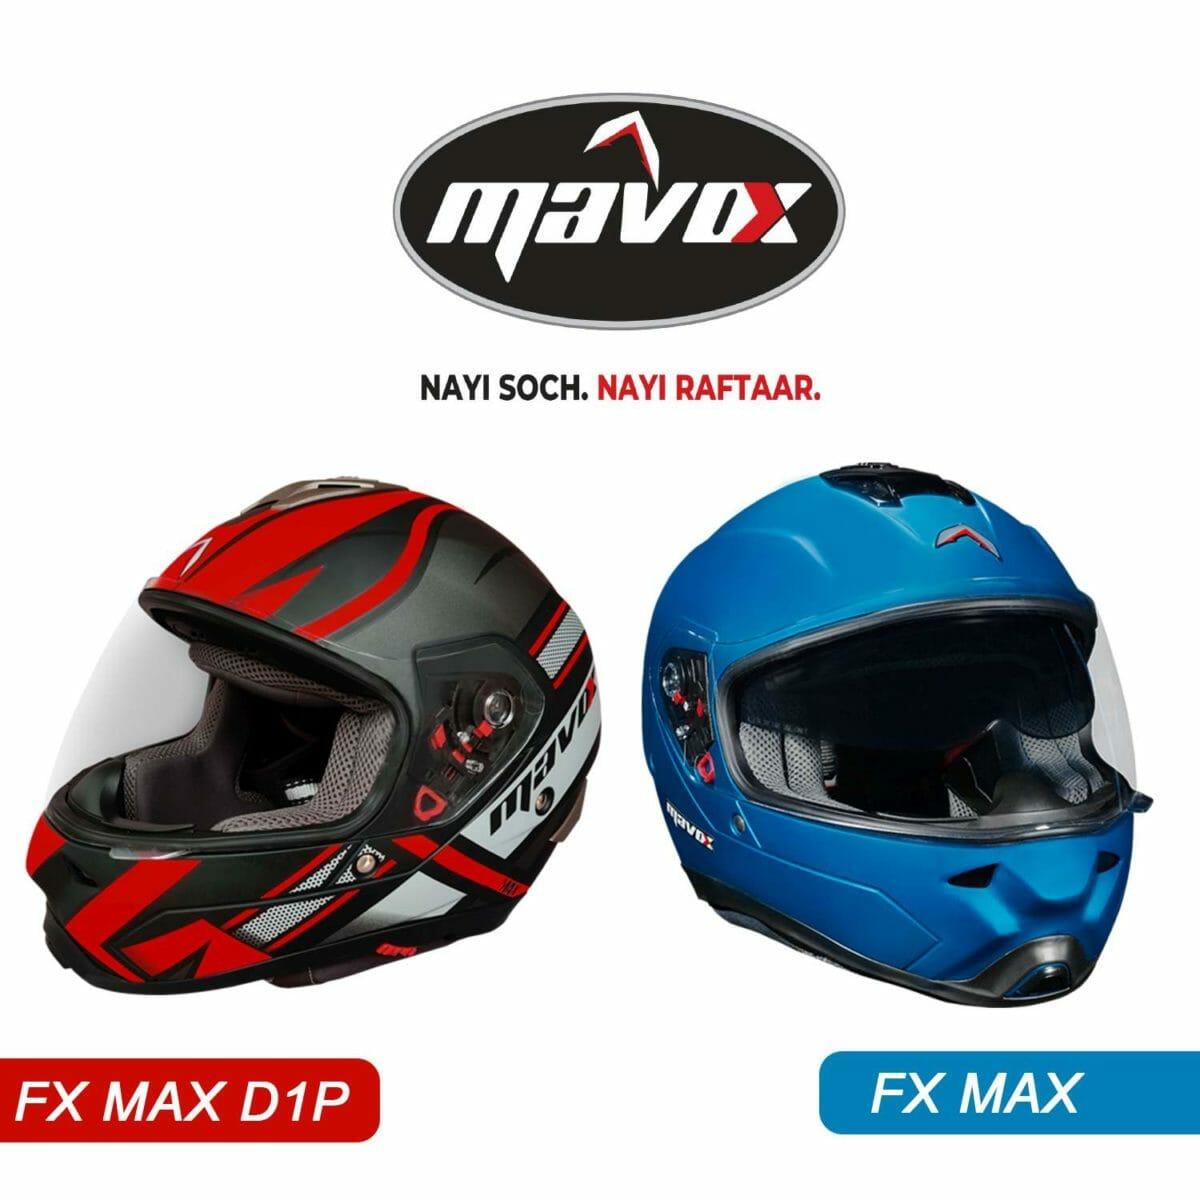 Mavox Air purifying helmets